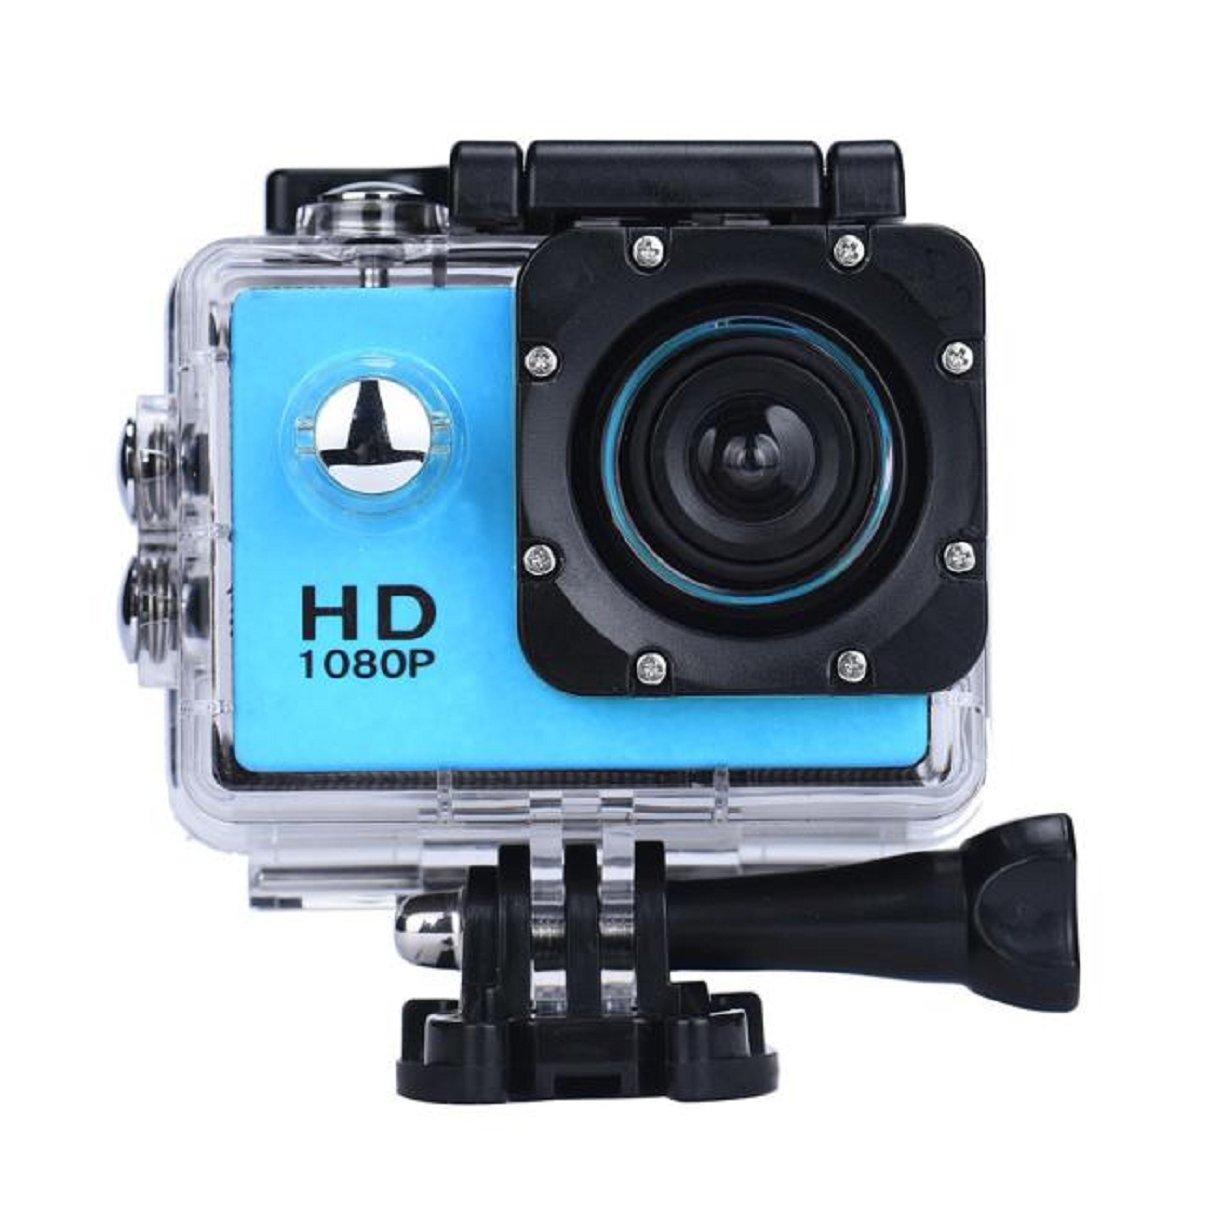 OverDose Mini 1080p Full HD-DV Sports Camcorder Car wasserdichte Tätigkeits-Kamera-Camcorder 233